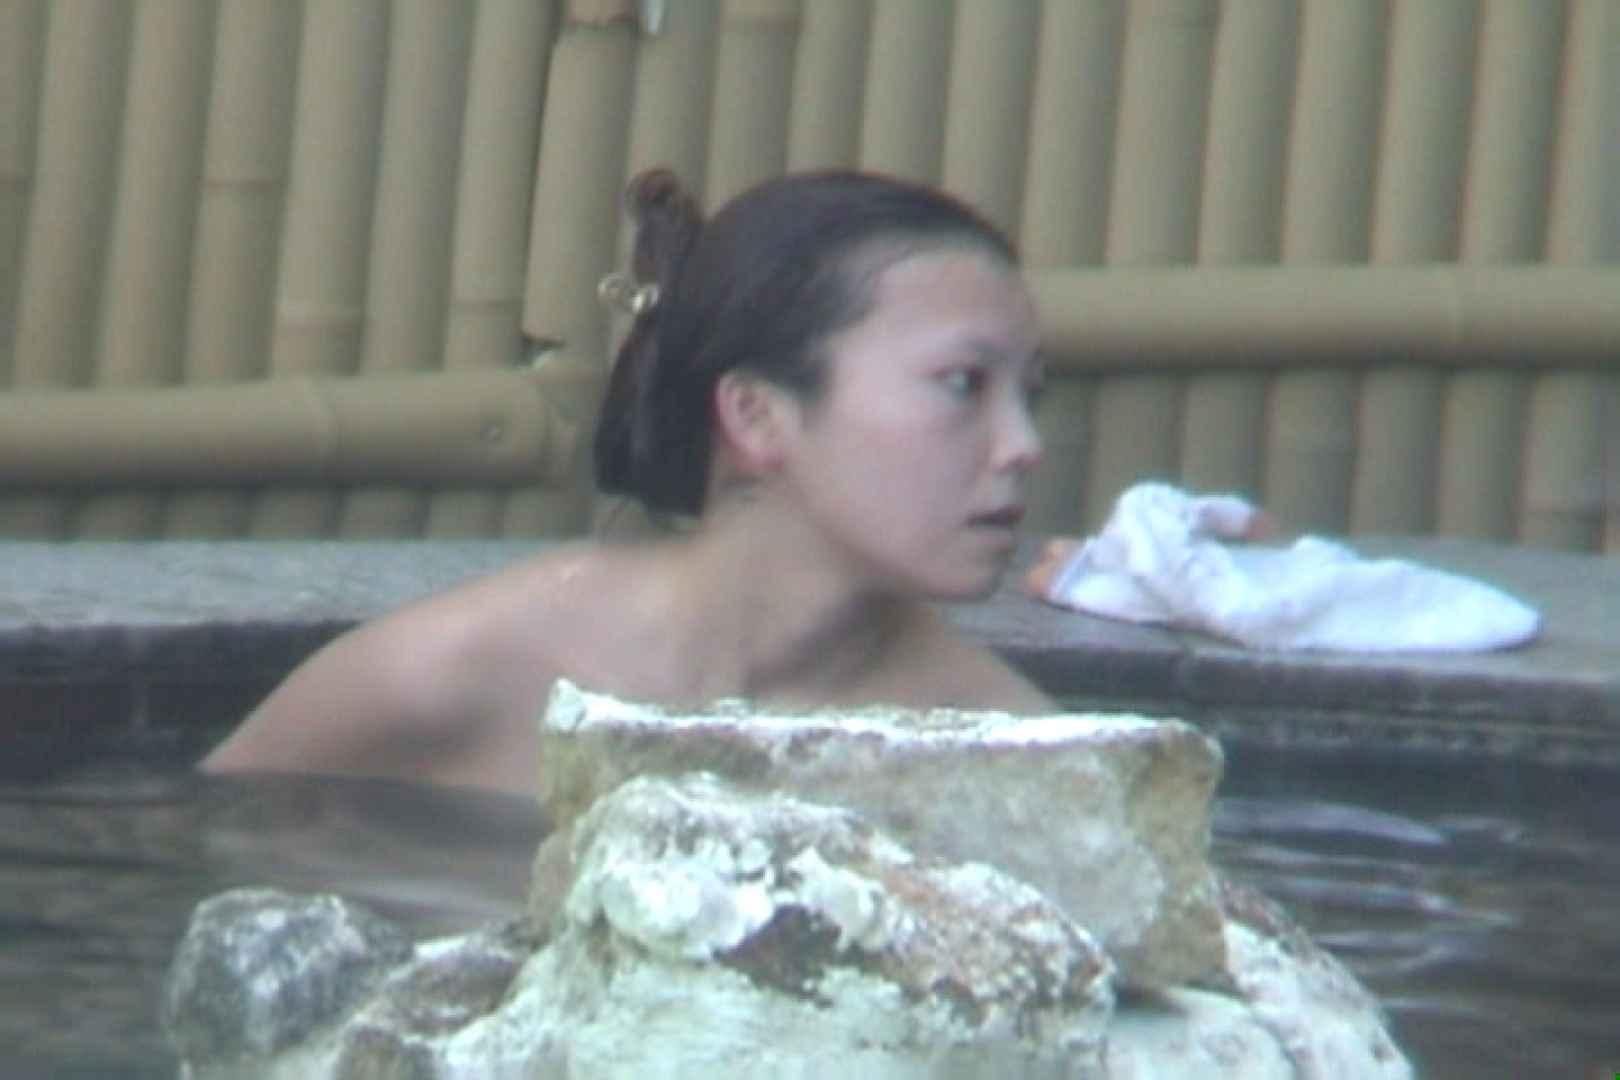 Aquaな露天風呂Vol.572 盗撮 | OLエロ画像  67PICs 16